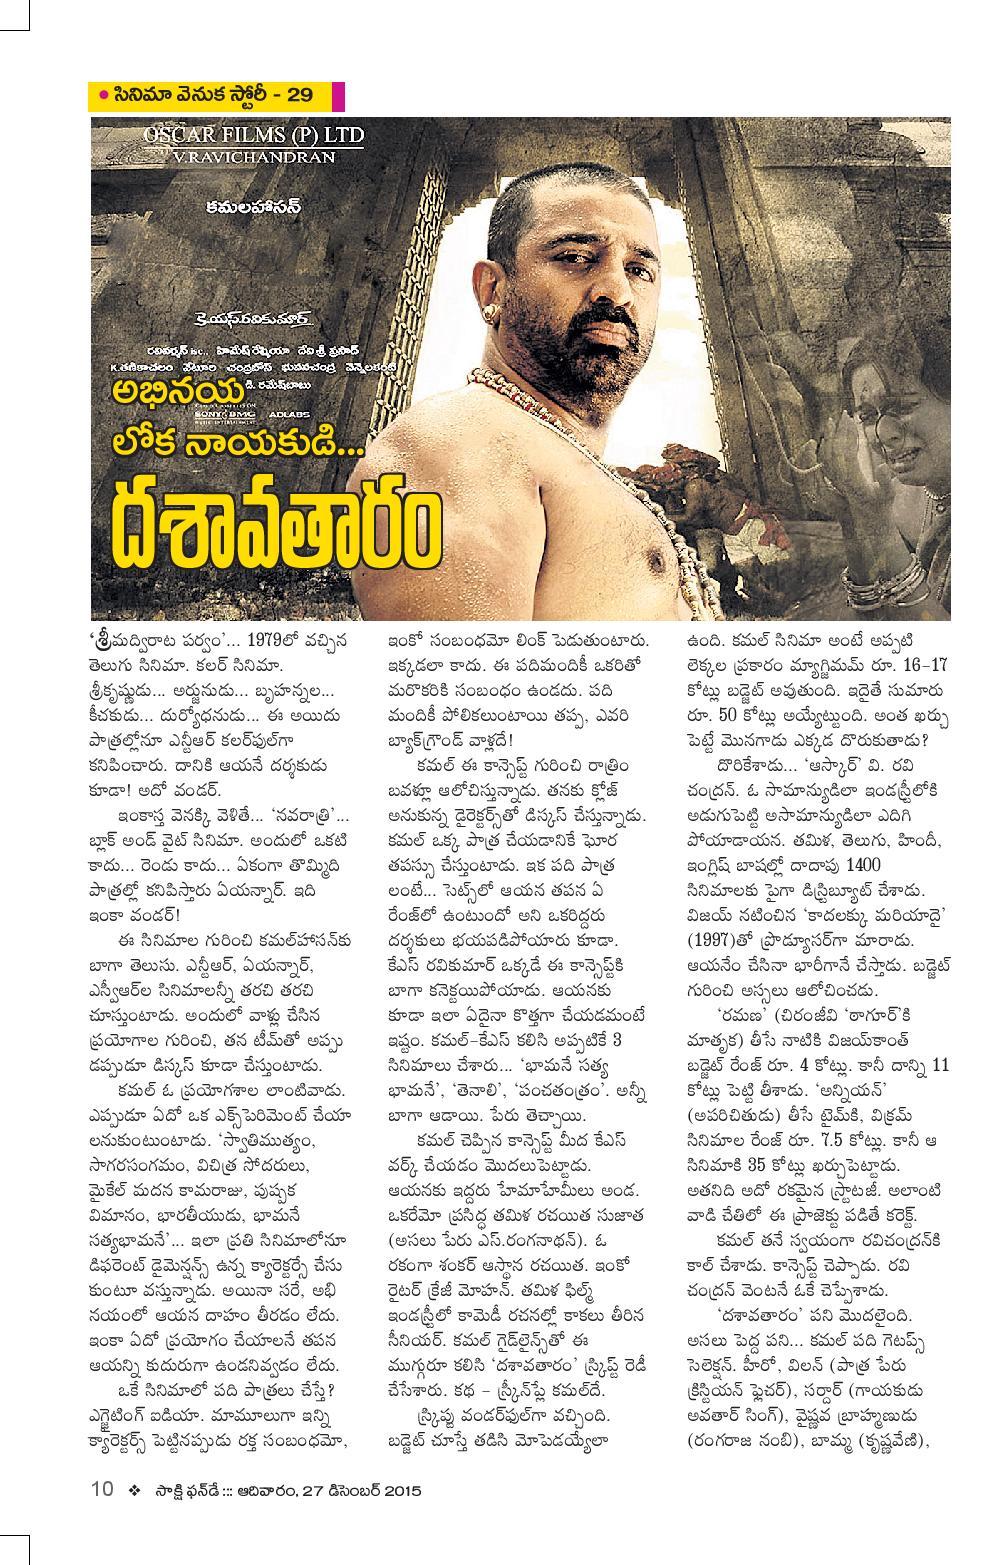 Cinema Venuka Story_Dasavatharalu_Funday (27-12-2015)-page-001